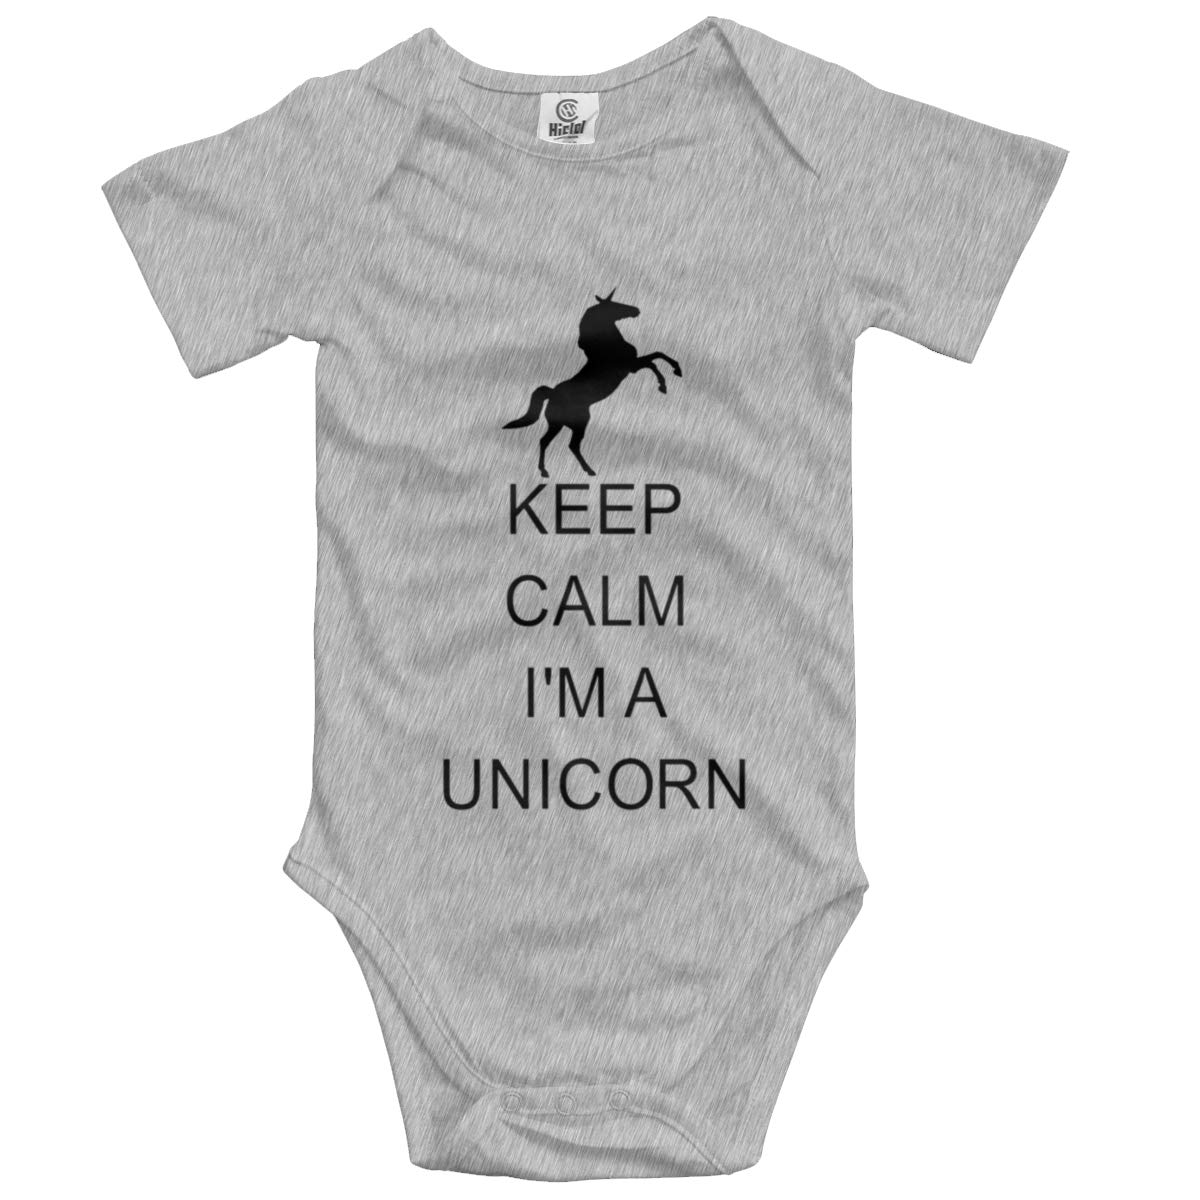 Keep Calm Unicorn Baby Boys Girls Jumpsuit Short-Sleeve Romper Bodysuits